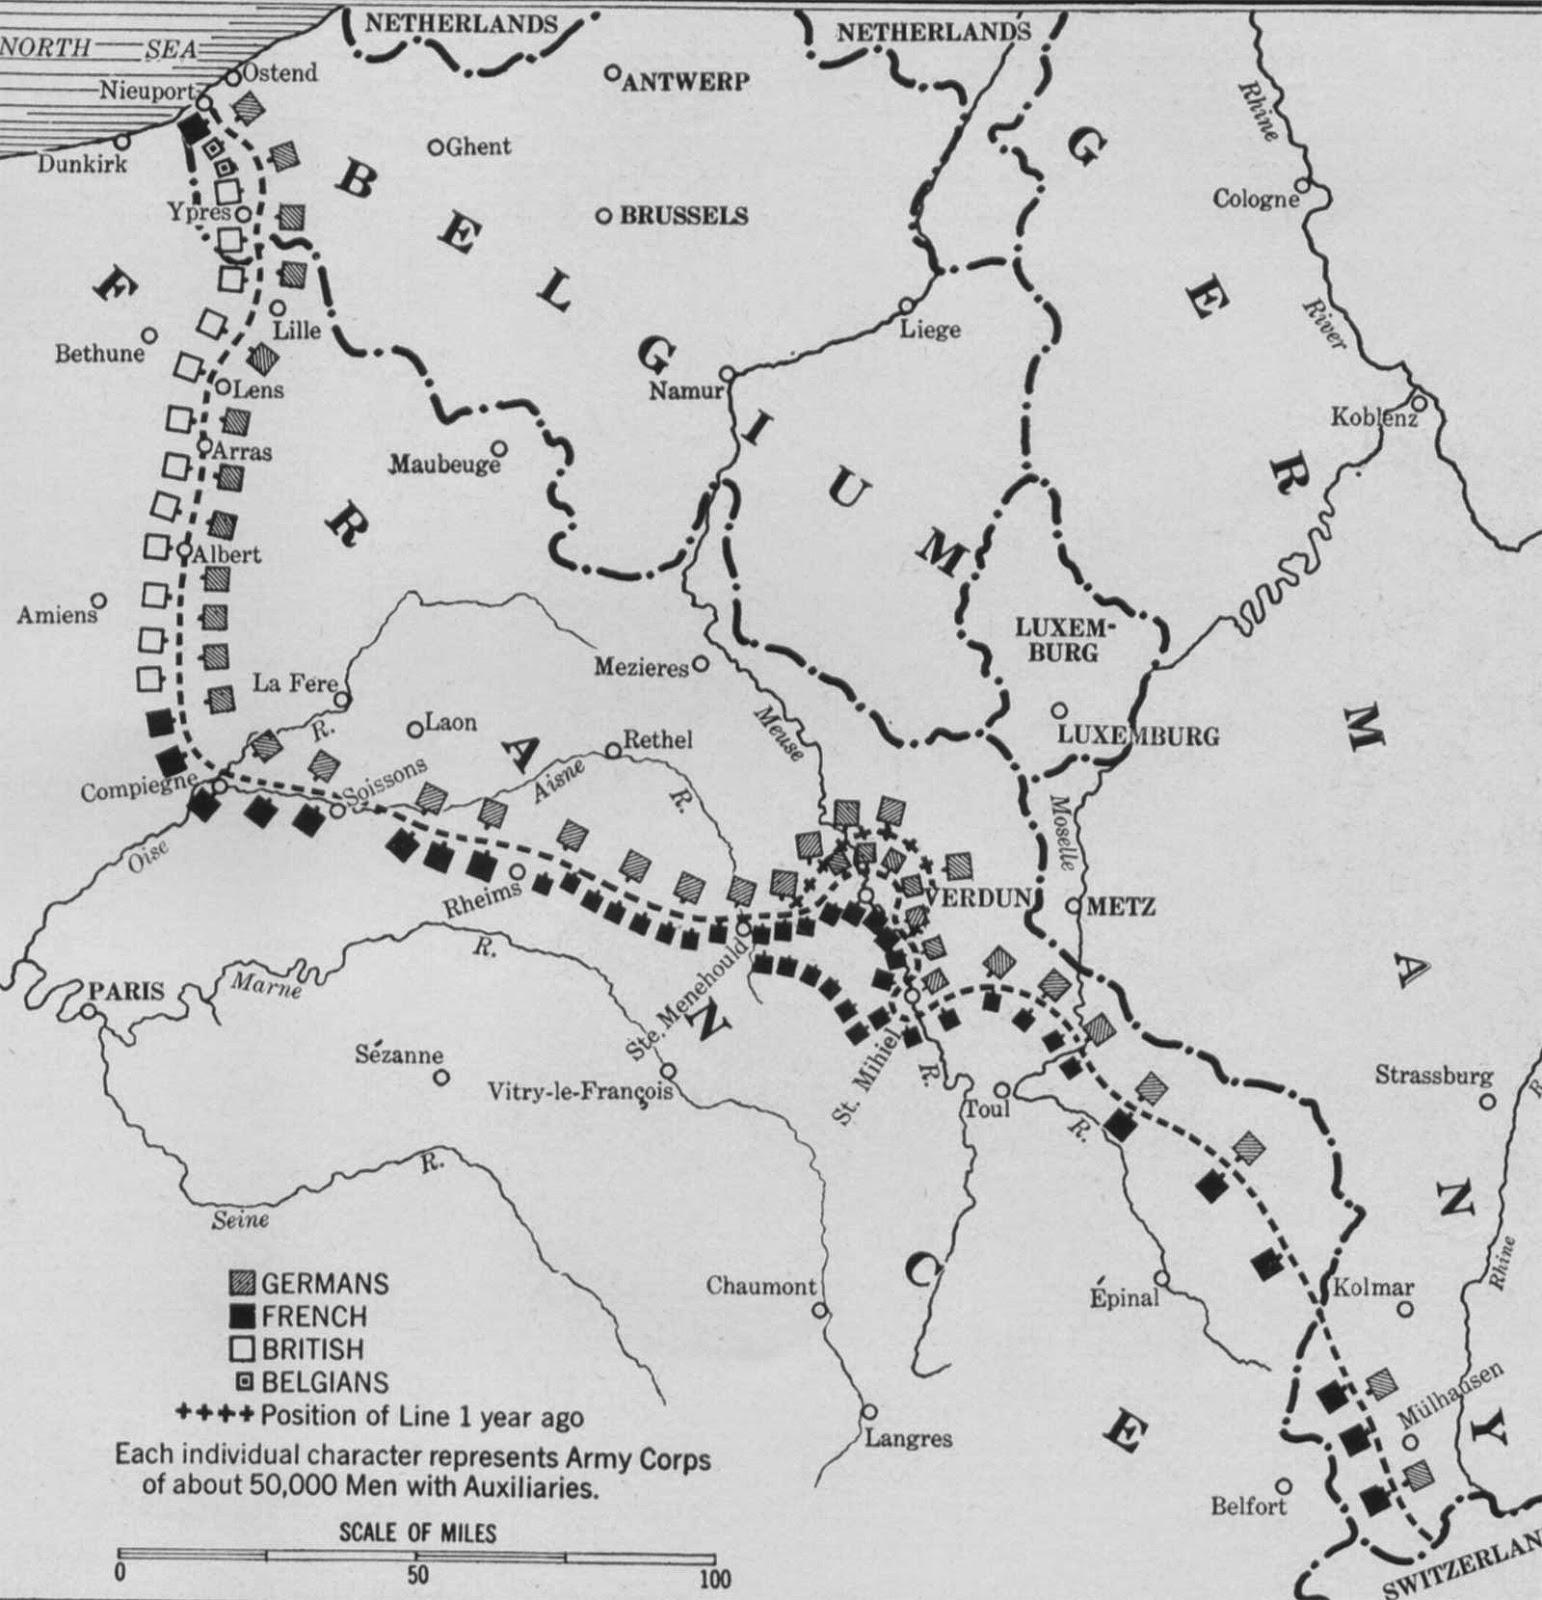 http://milpas.cc/rifles/ZFiles/WWI/Maps/nw_map_wf_1916_01.jpg